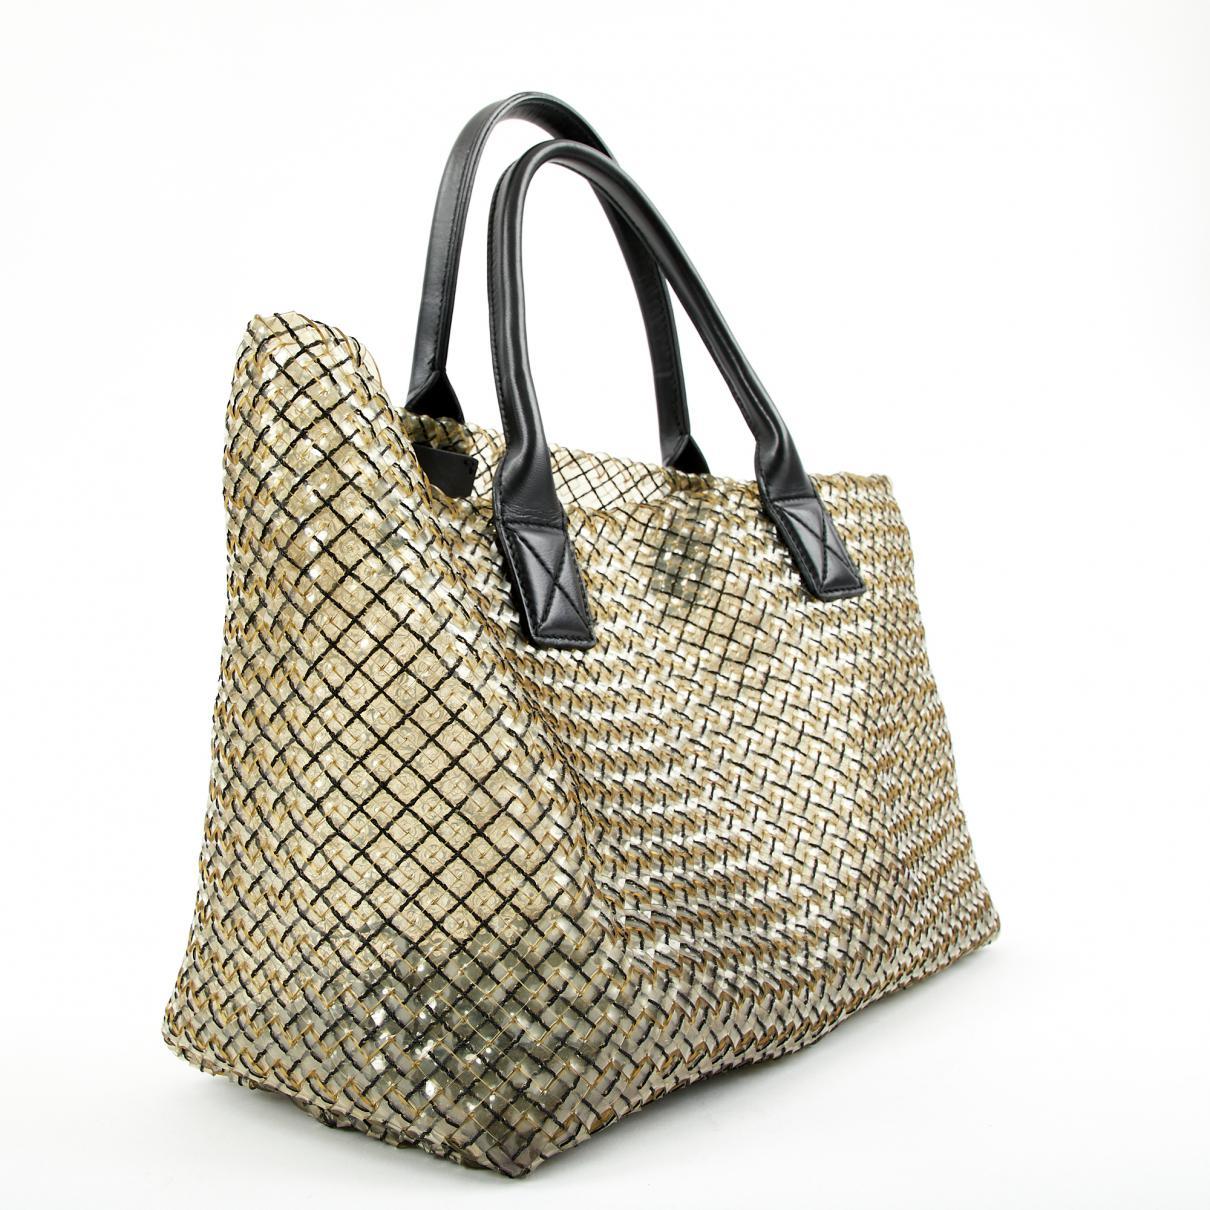 a13084041f Bottega Veneta - Multicolor Fourre-tout Other Plastic Handbag - Lyst. View  fullscreen